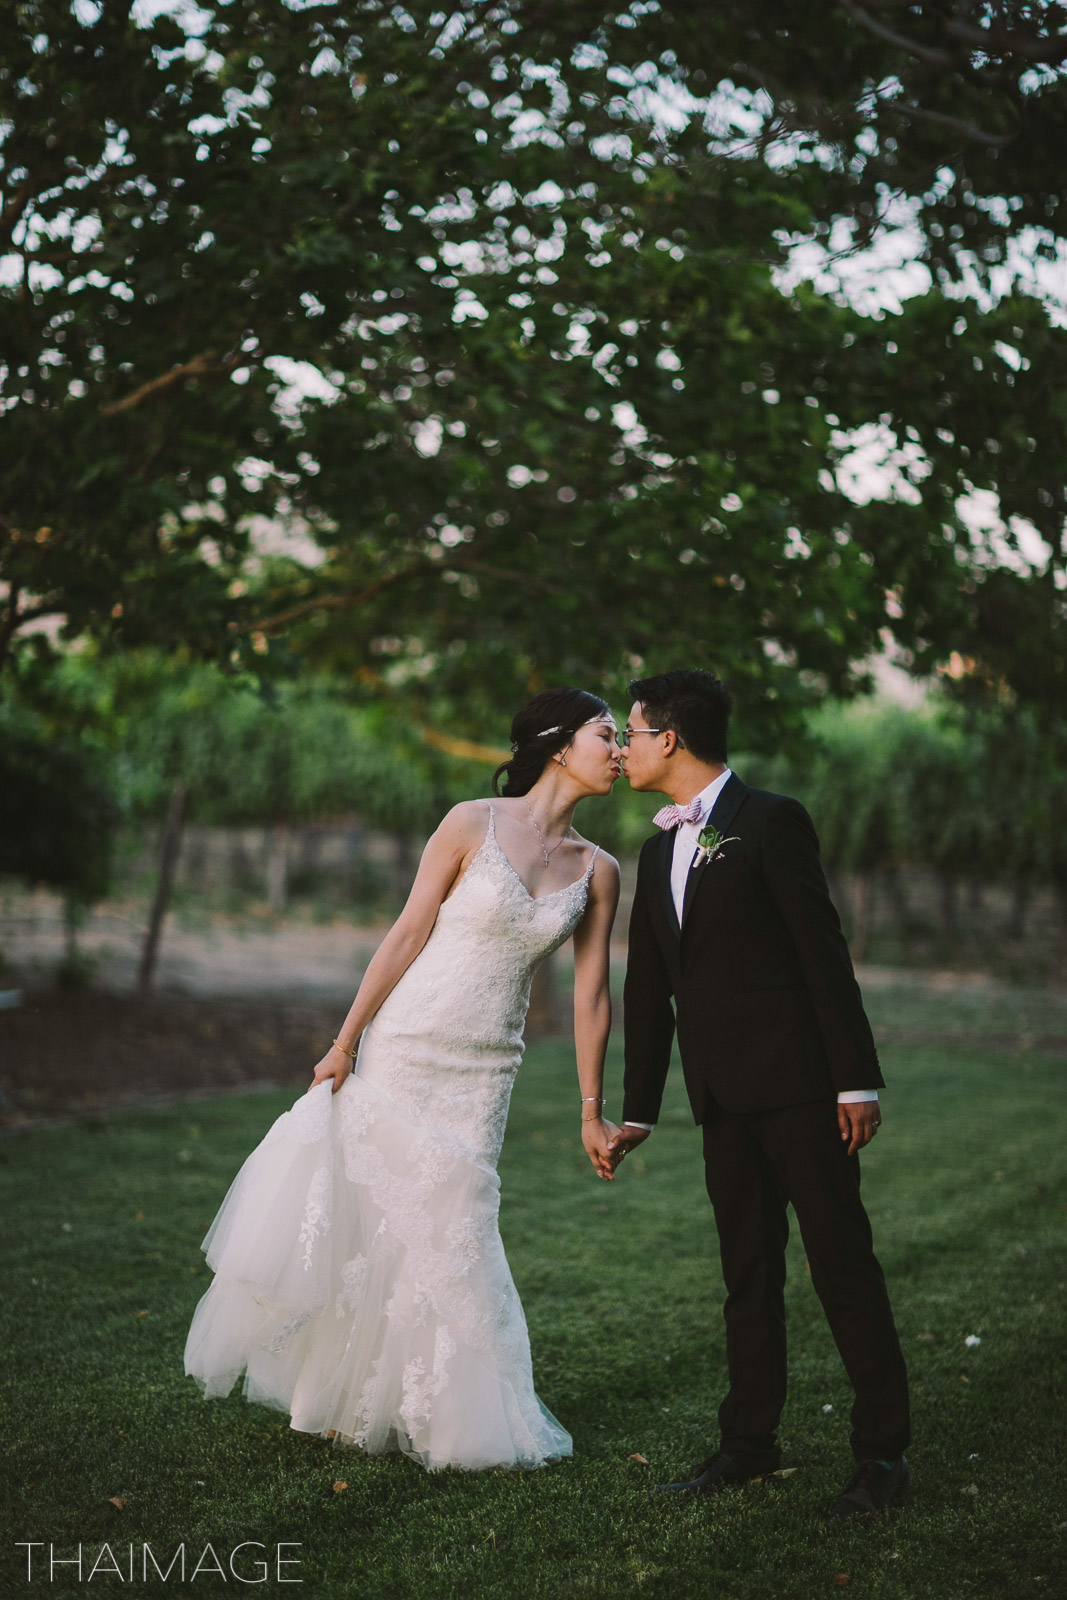 00100-20160612- JuneEdmond-Chung-Wedding.jpg